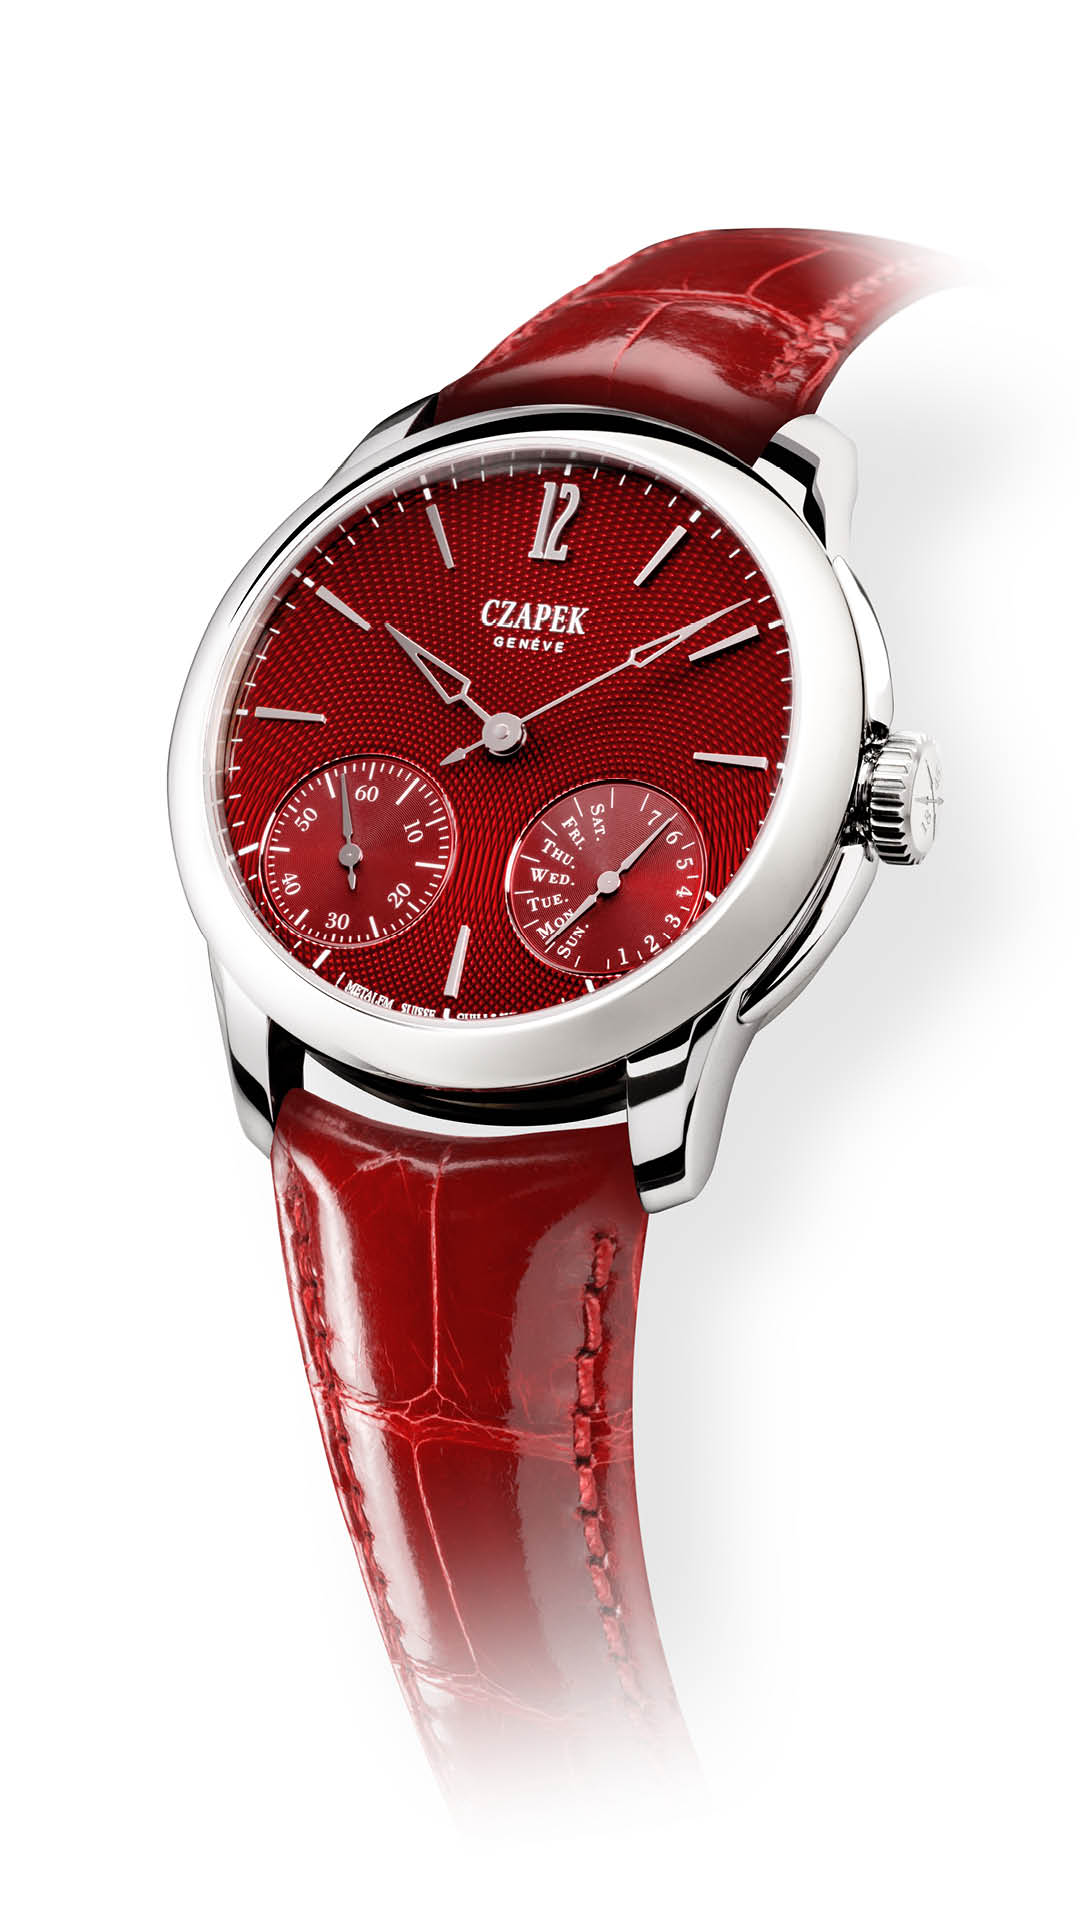 Czapek-Cie-Quai-des-Bergues-rhubarb-red